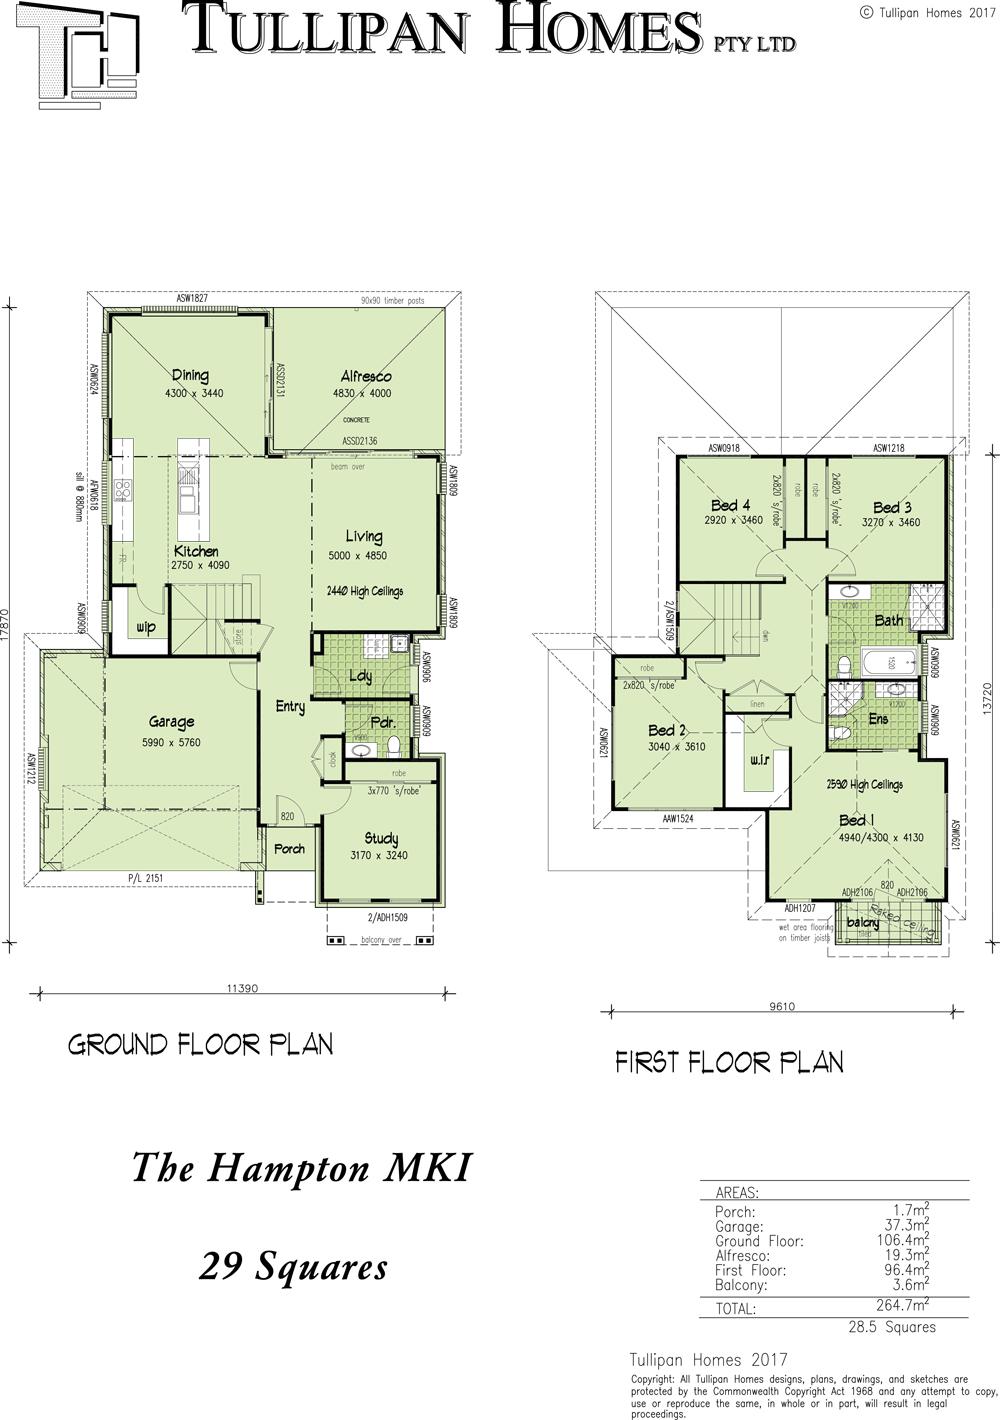 HAMPTON MKI, Home Design, Tullipan Homes